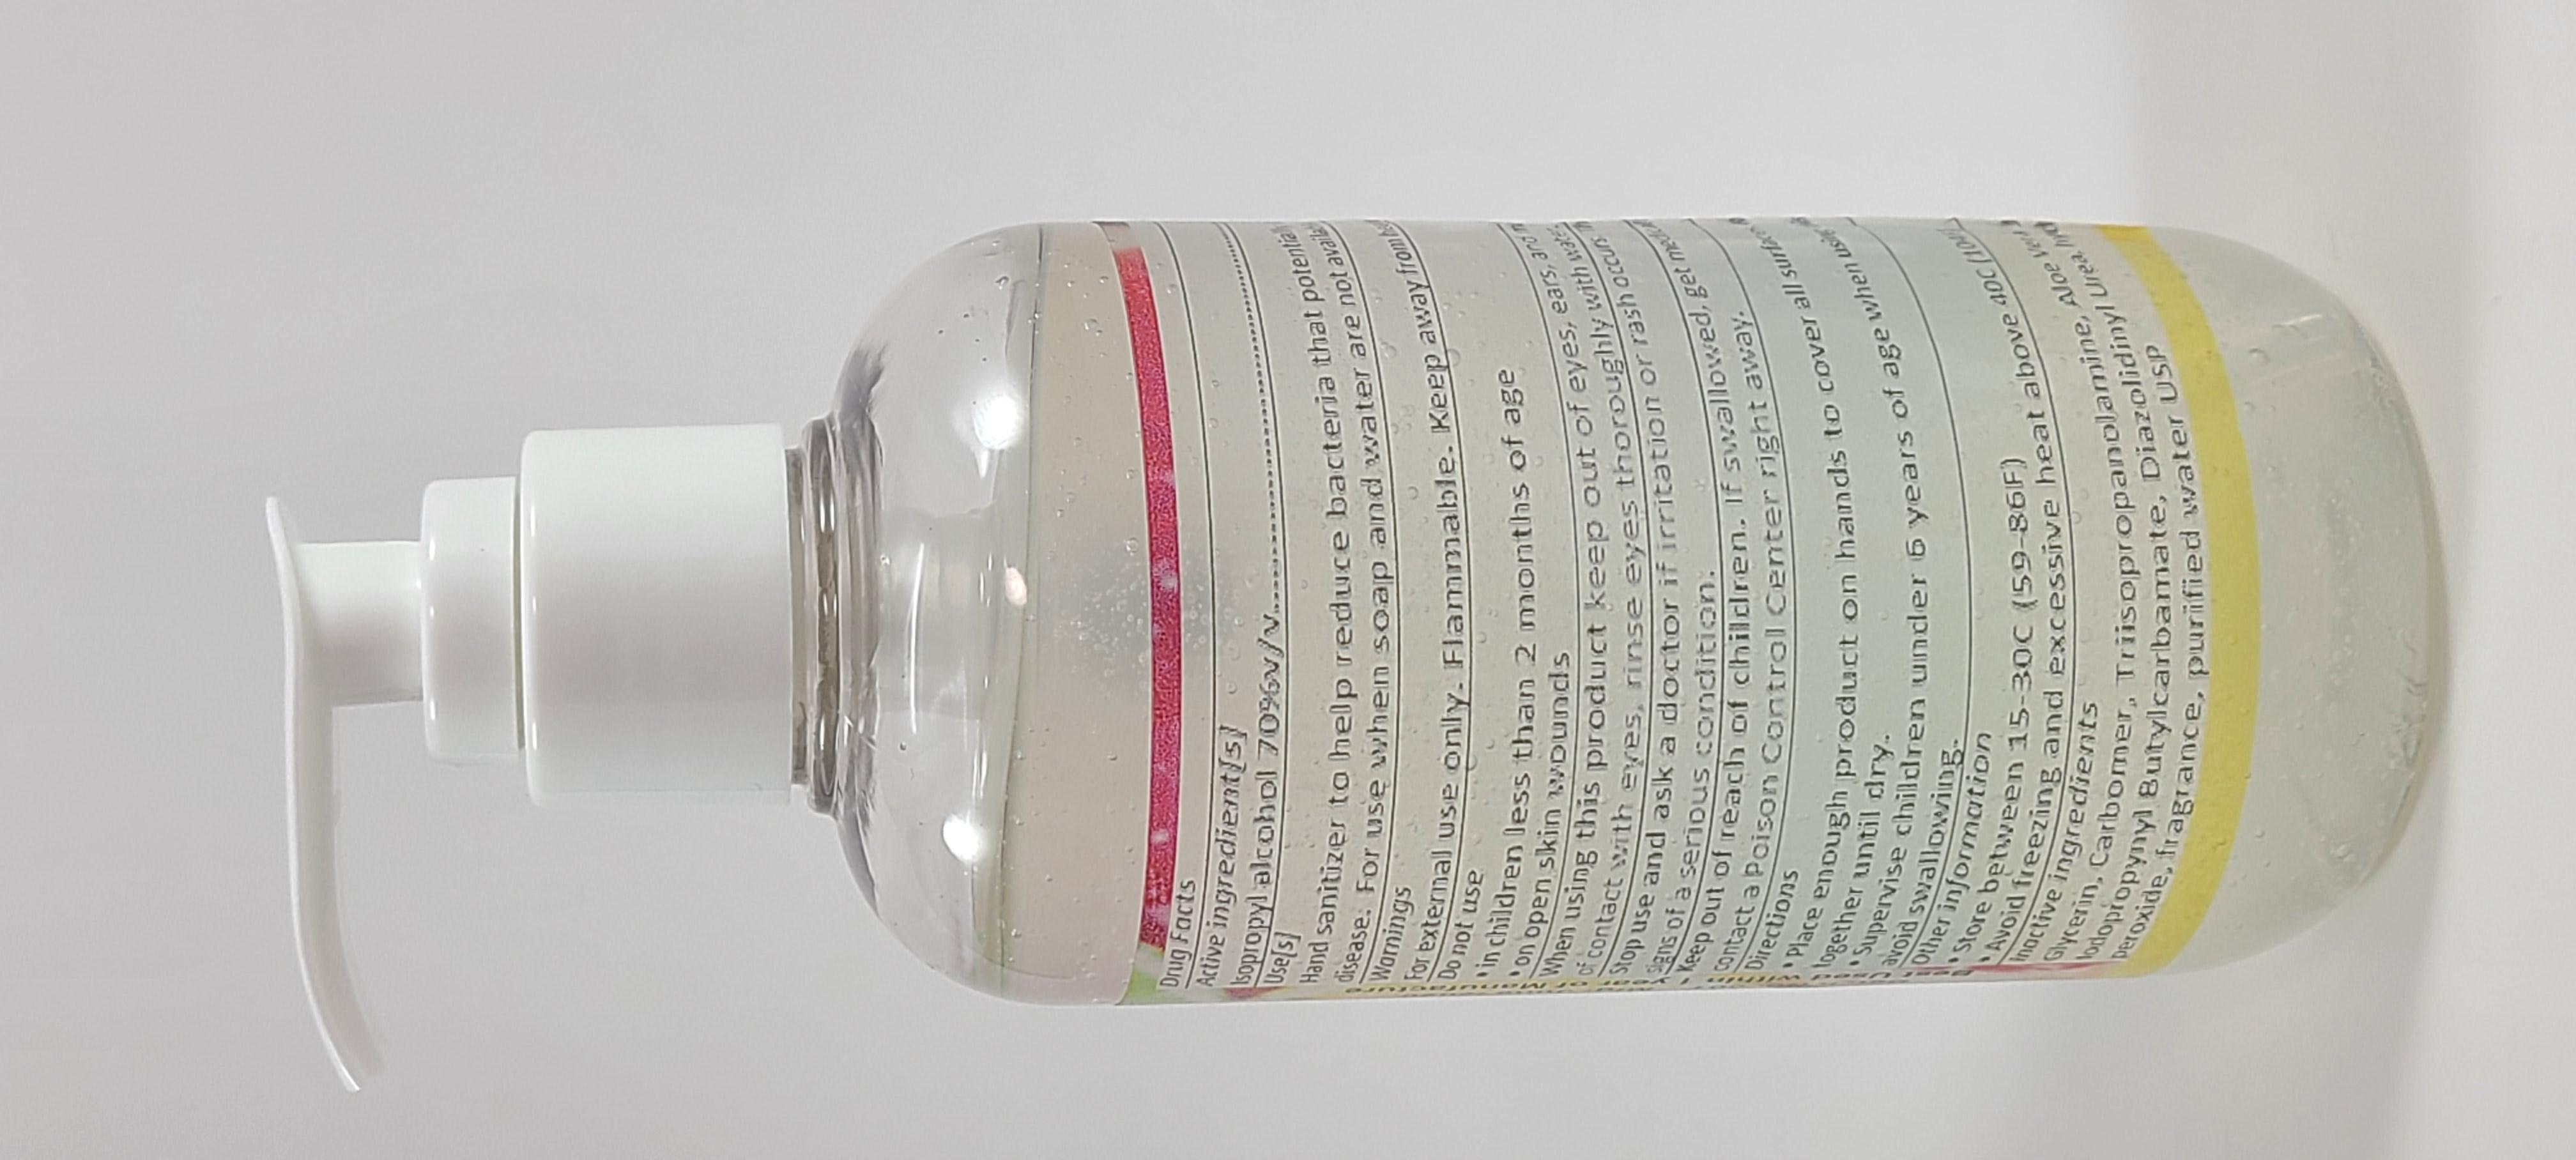 Back Label NDC: <a href=/NDC/79206-001-05>79206-001-05</a>